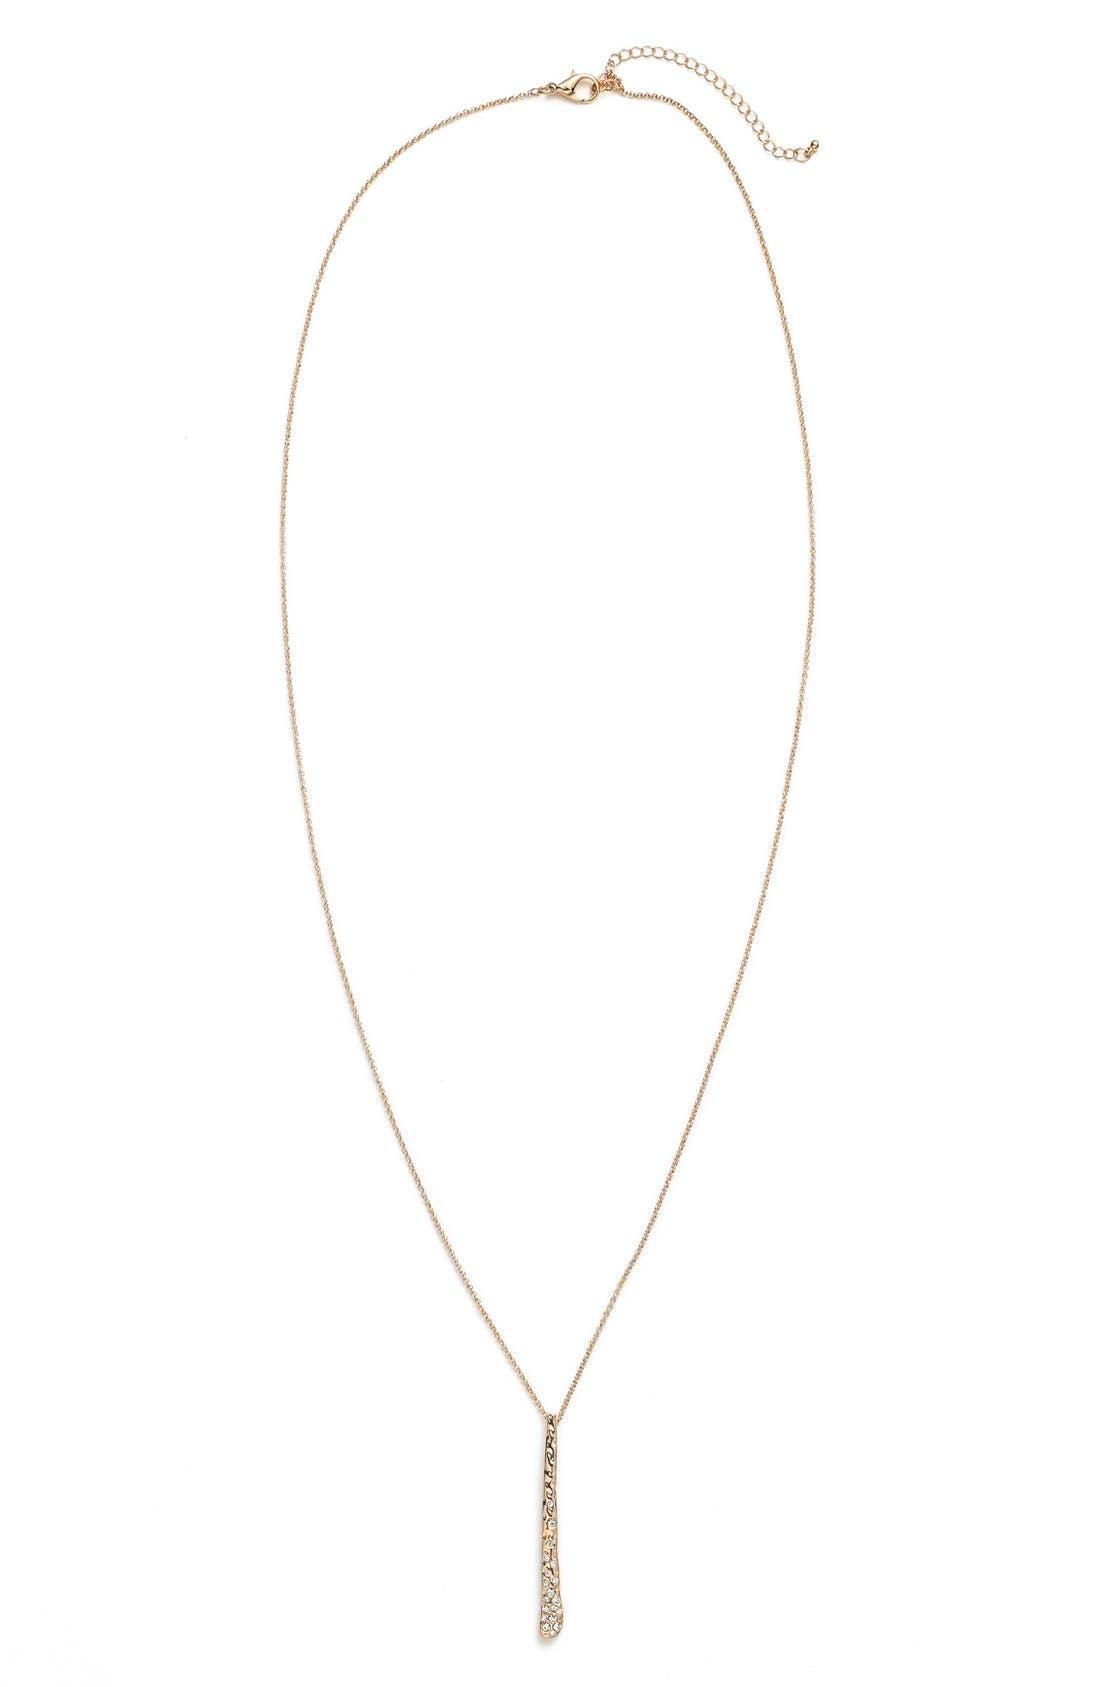 Alternate Image 1 Selected - BP. Rhinestone Hammered Bar Pendant Necklace